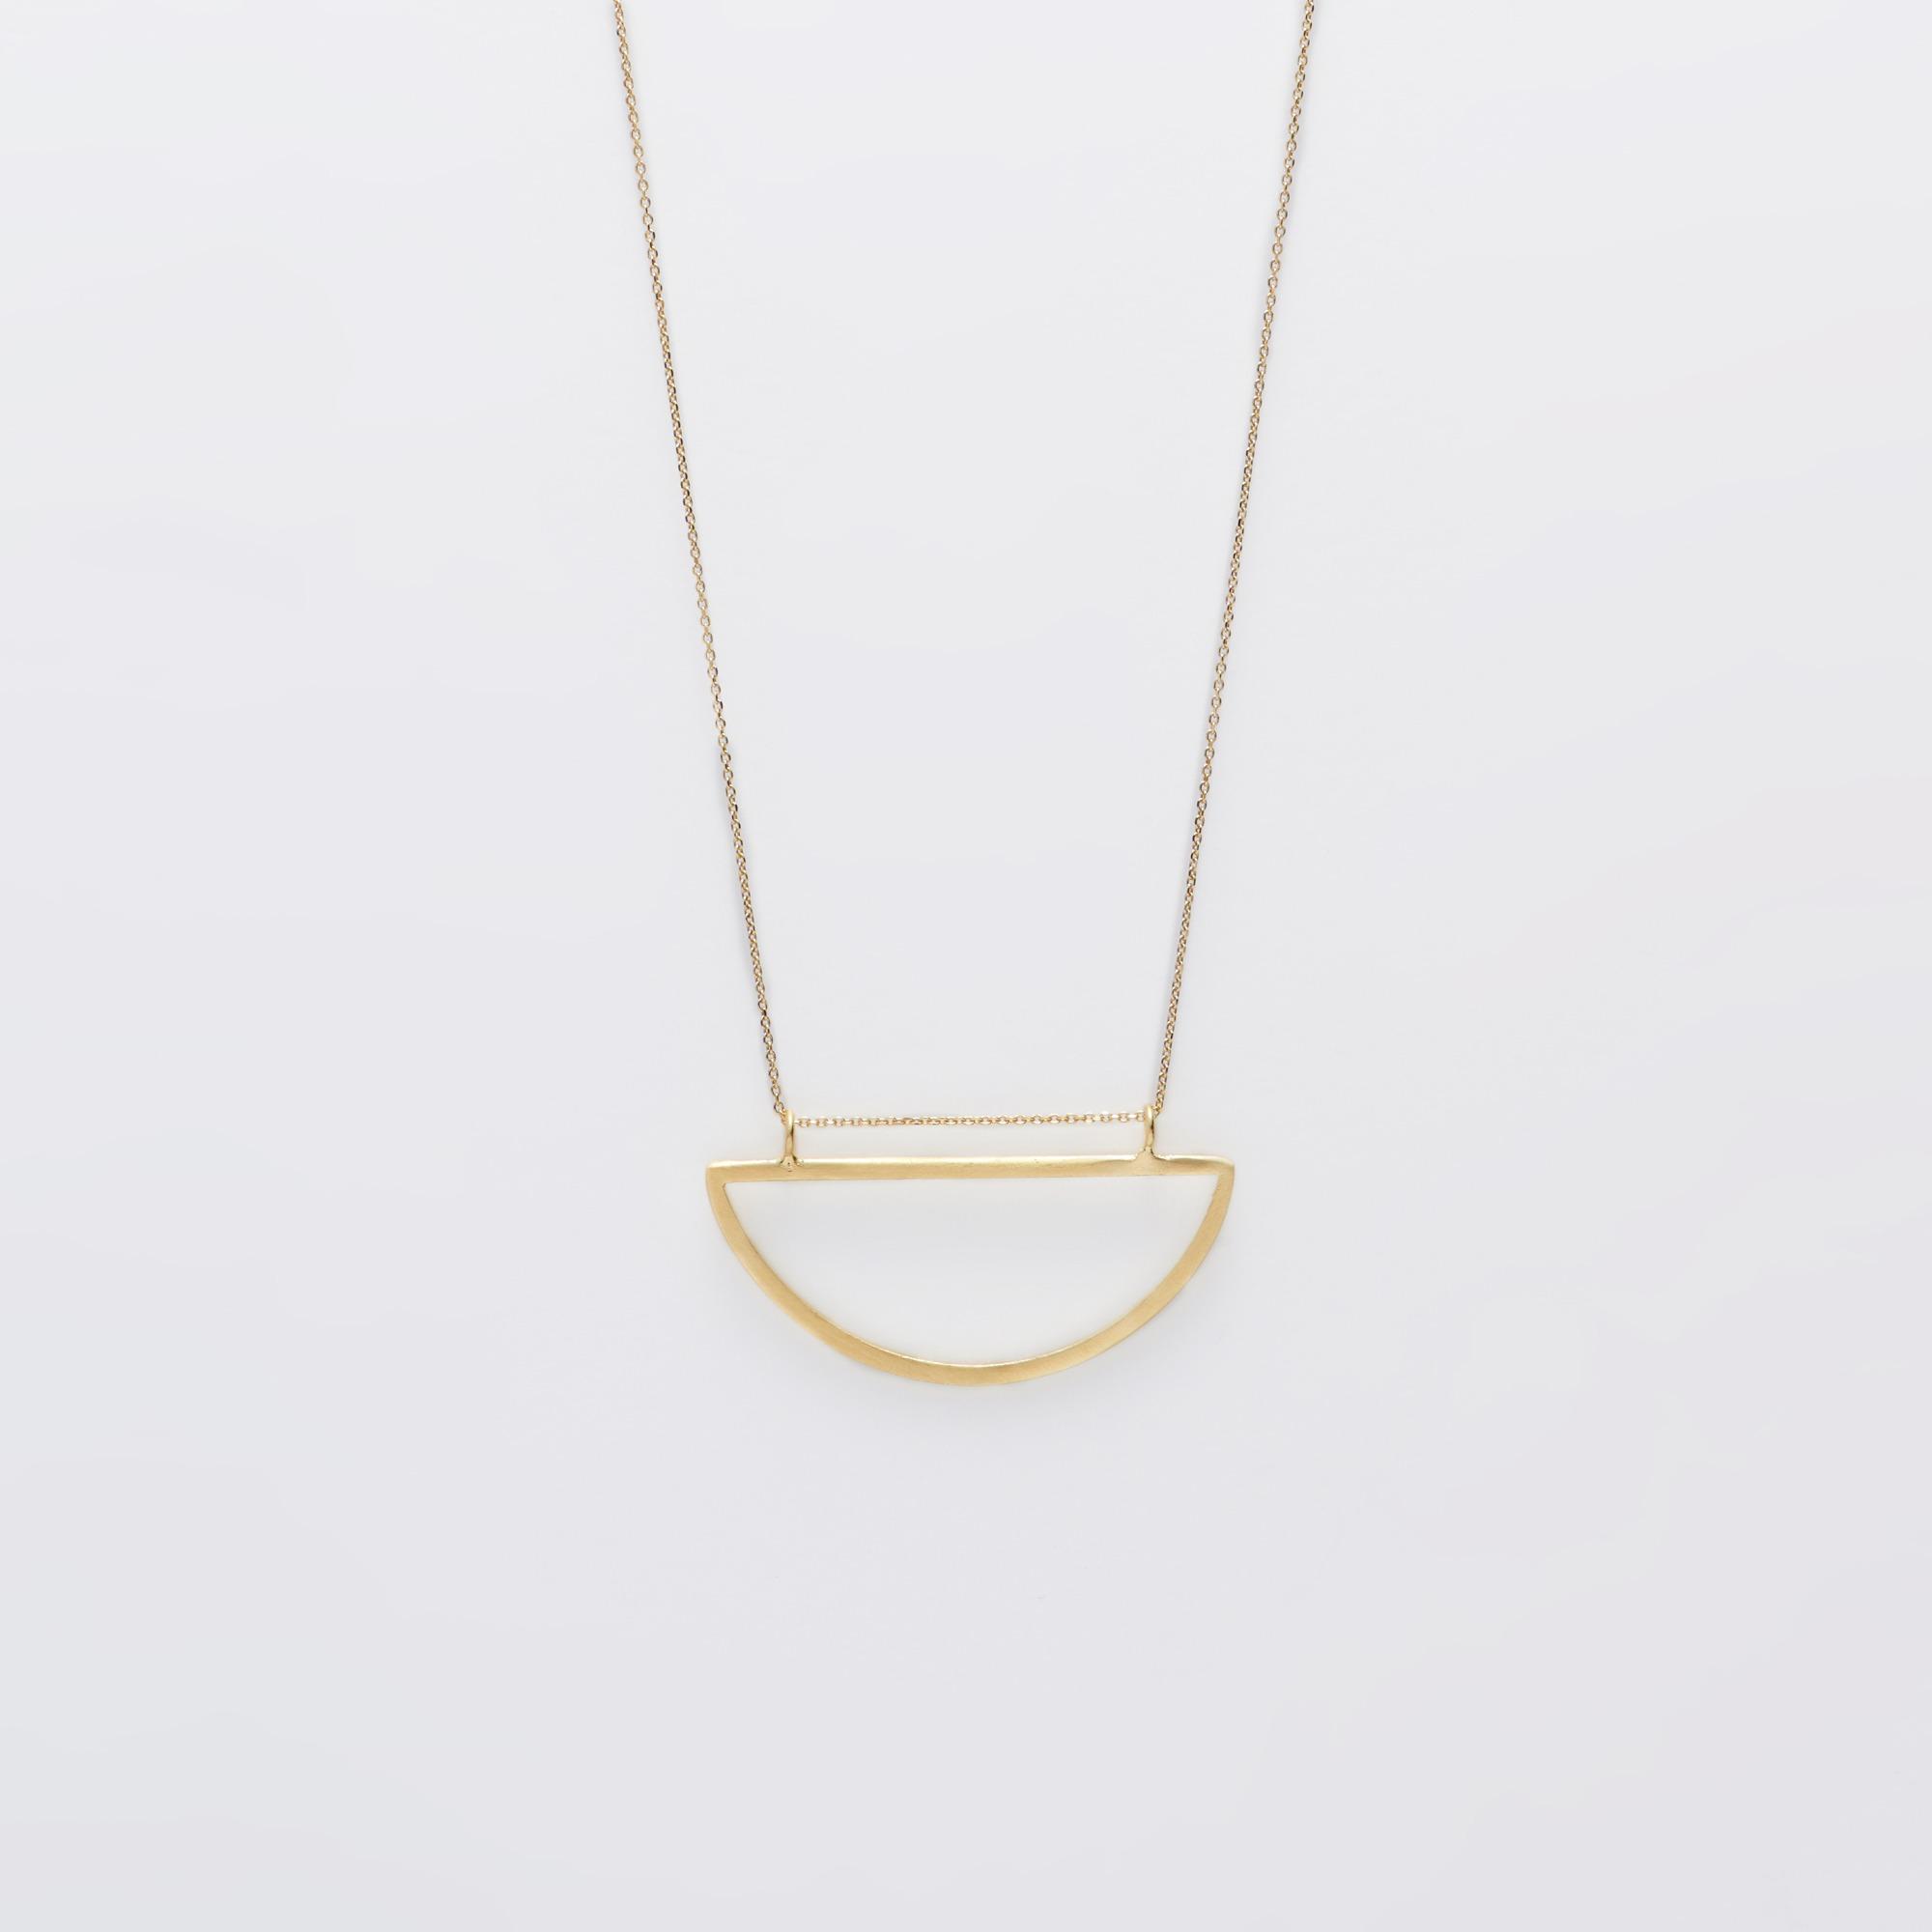 200-45 Double circle necklace κολιέ ασημένιο-χρυσό